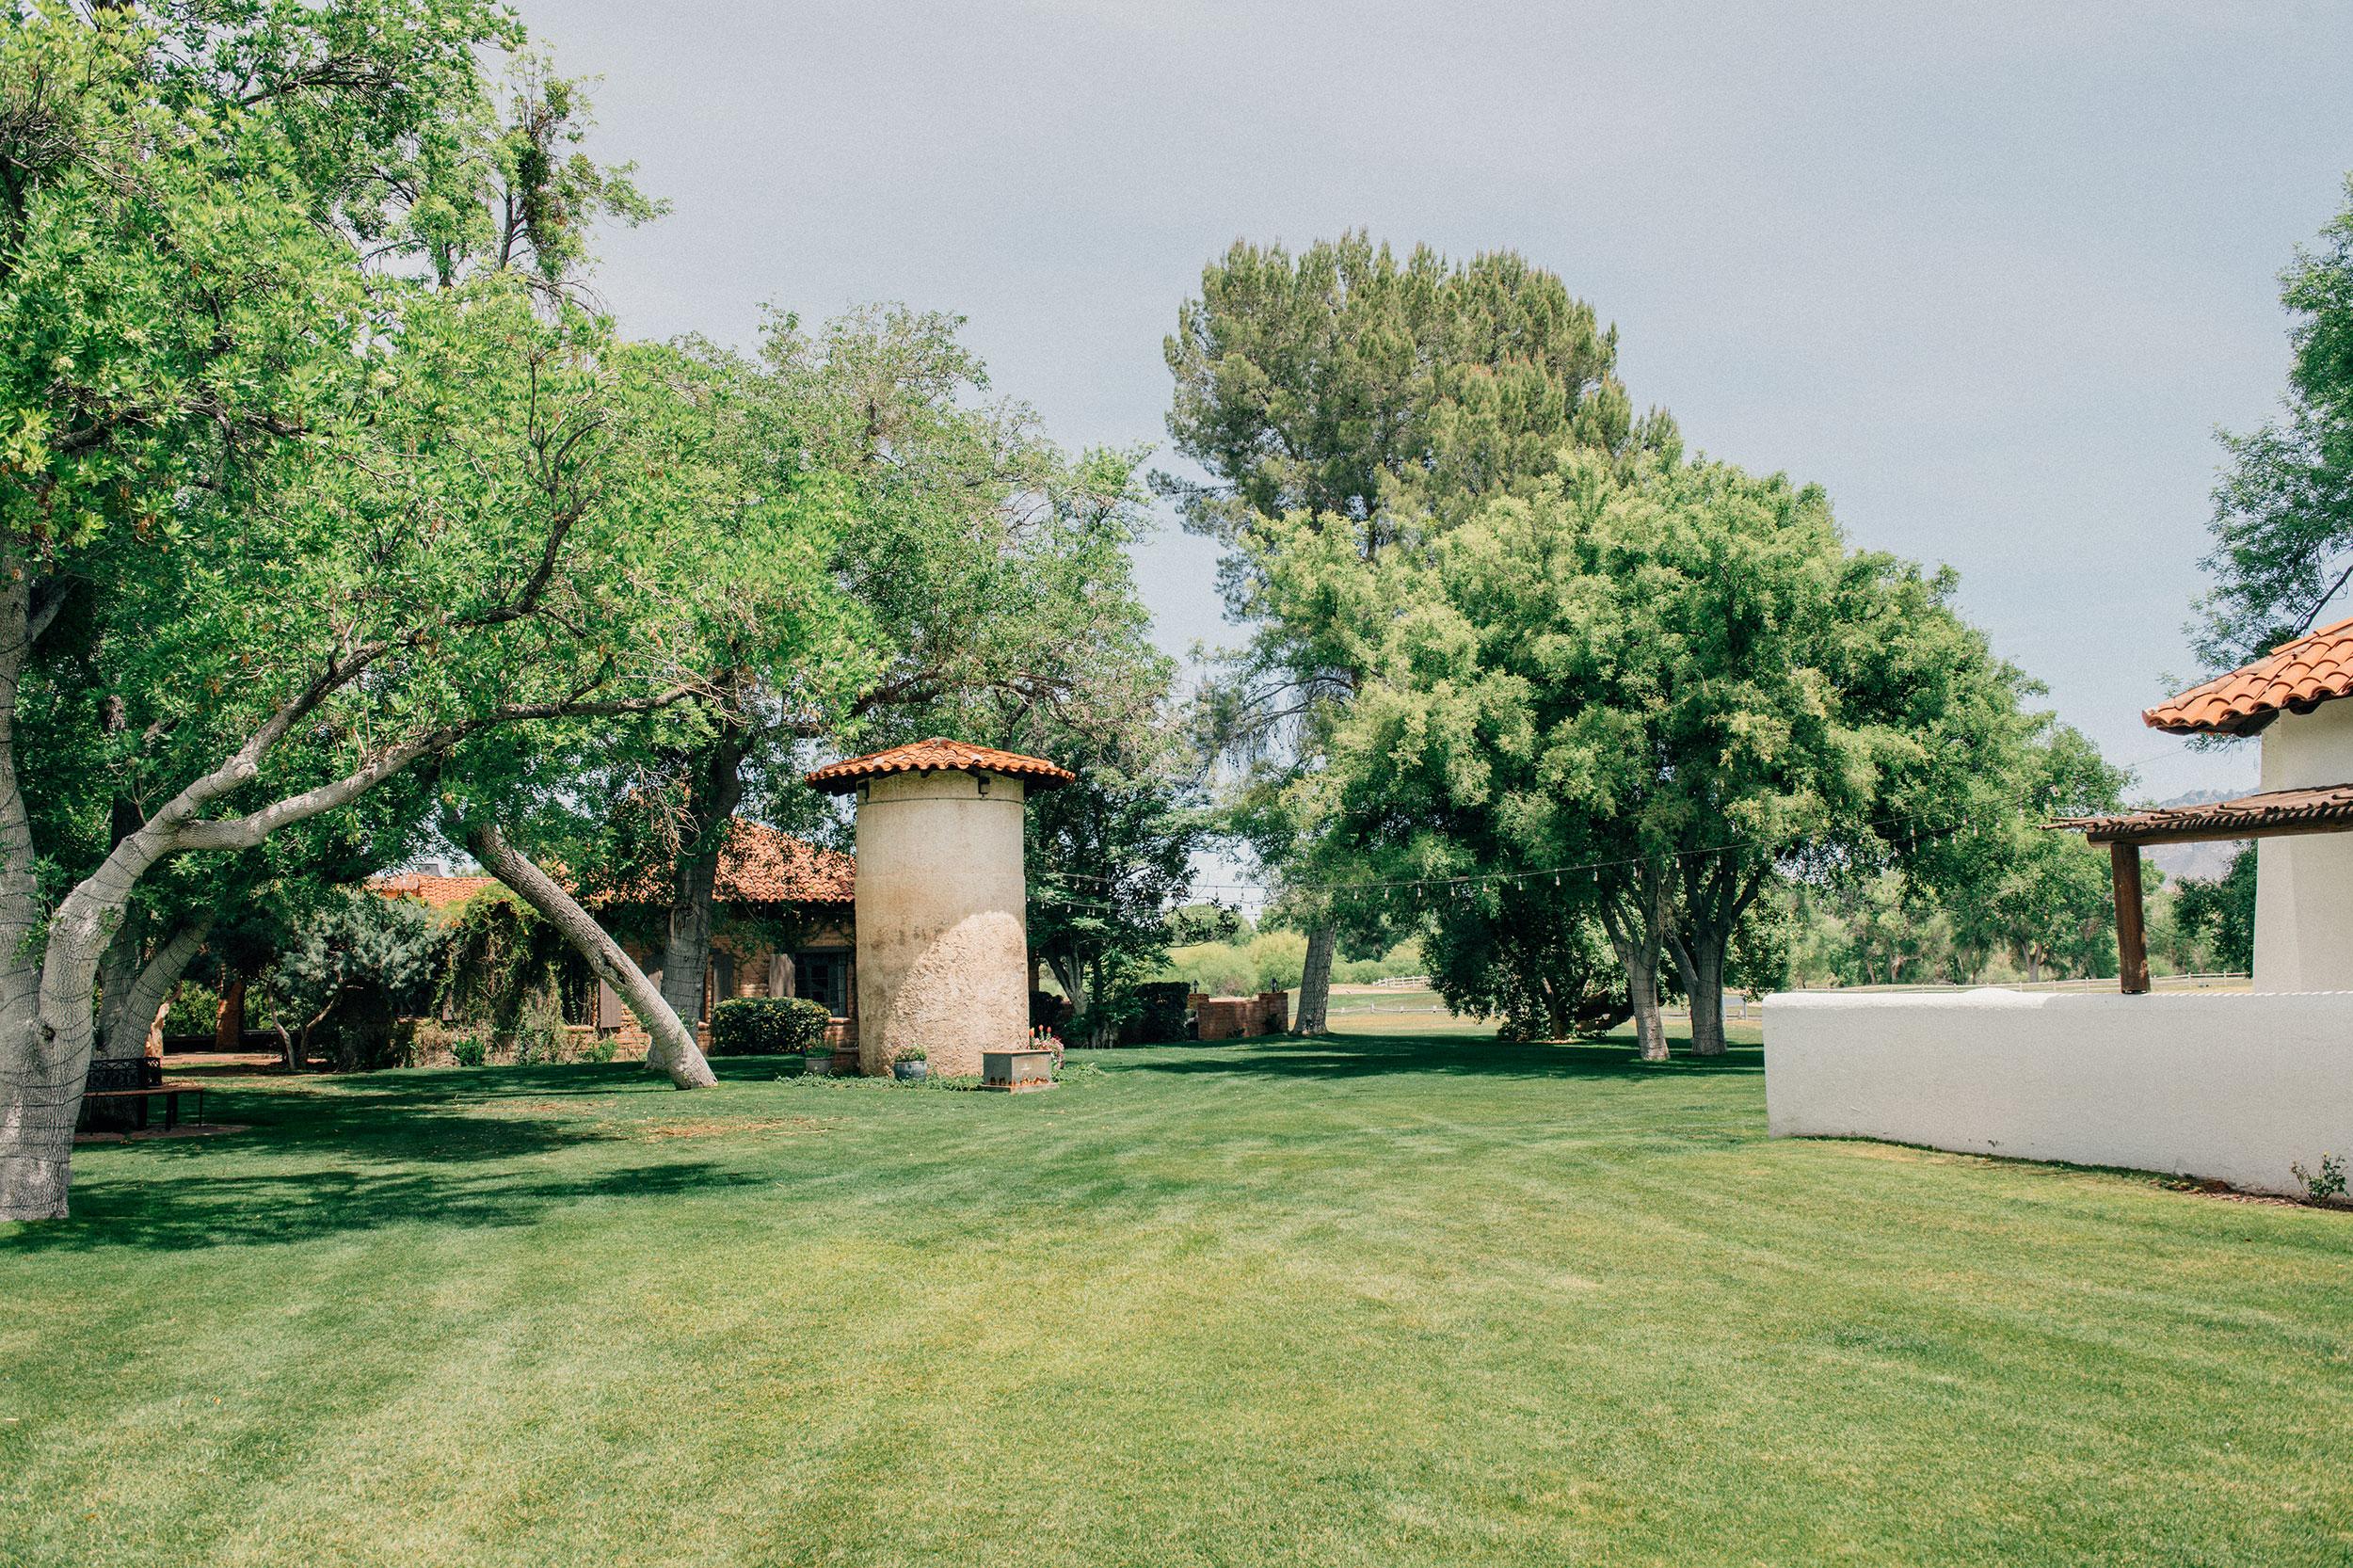 The Tubac Golf Resort & Spa